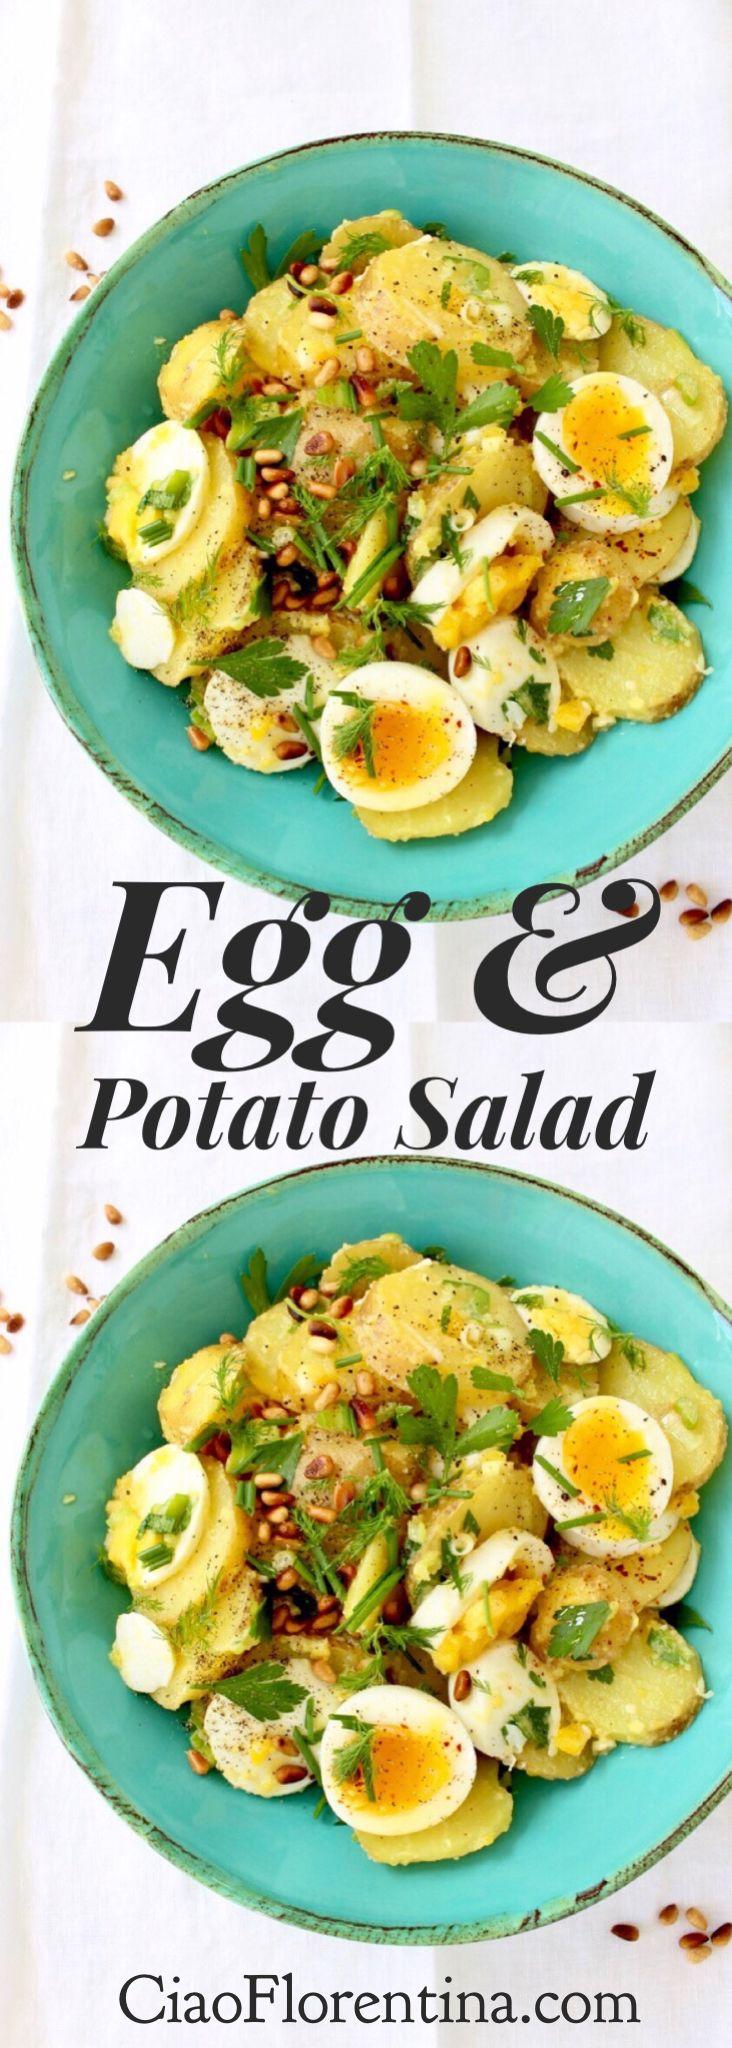 Rustic Egg and Potato Salad Italian Style, with Toasted Pine Nuts and Fresh Herbs   CiaoFlorentina.com @CiaoFlorentina